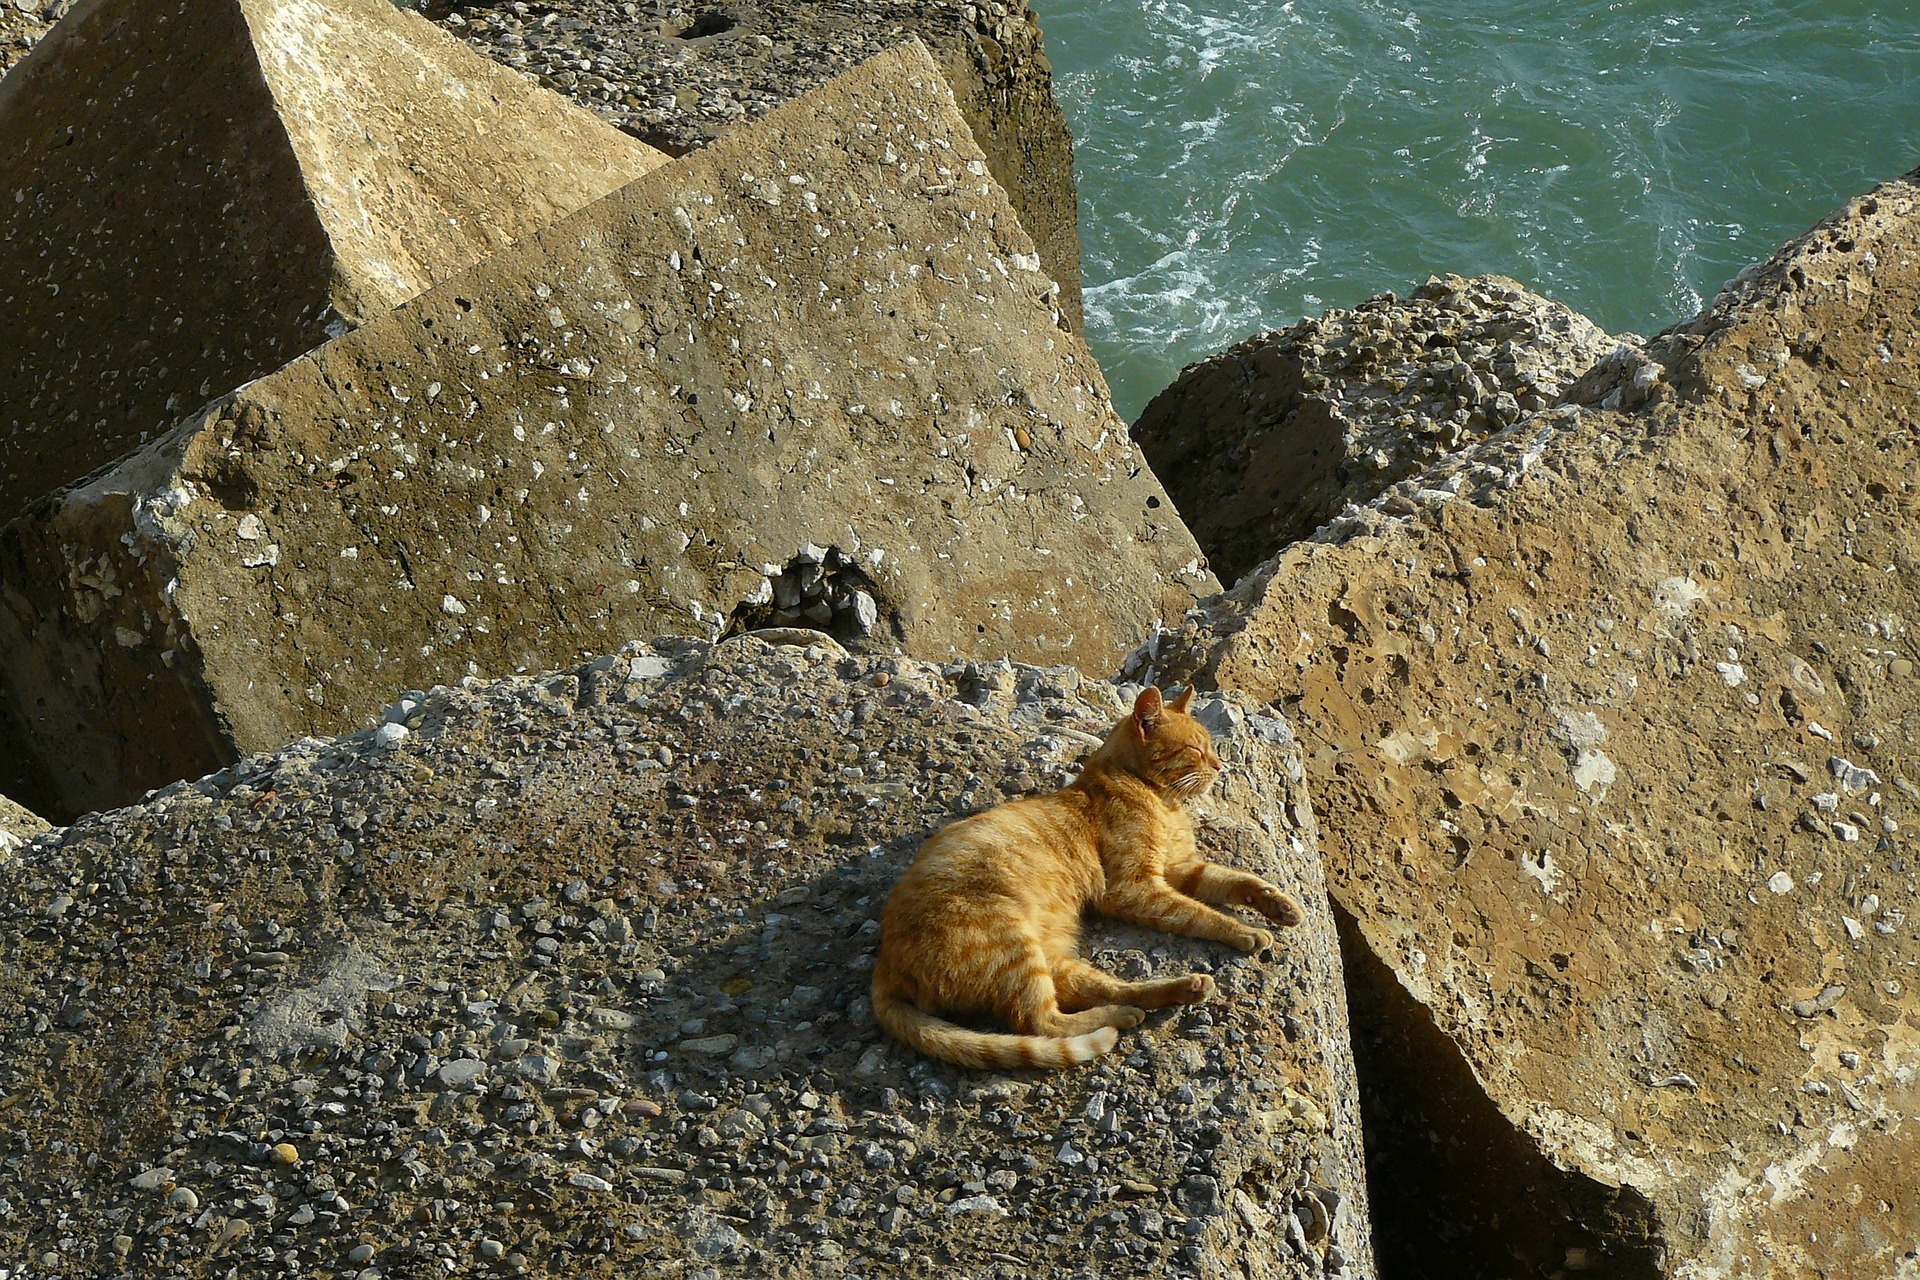 Pet, Animal, Cat, Friend, Loyal, HQ Photo